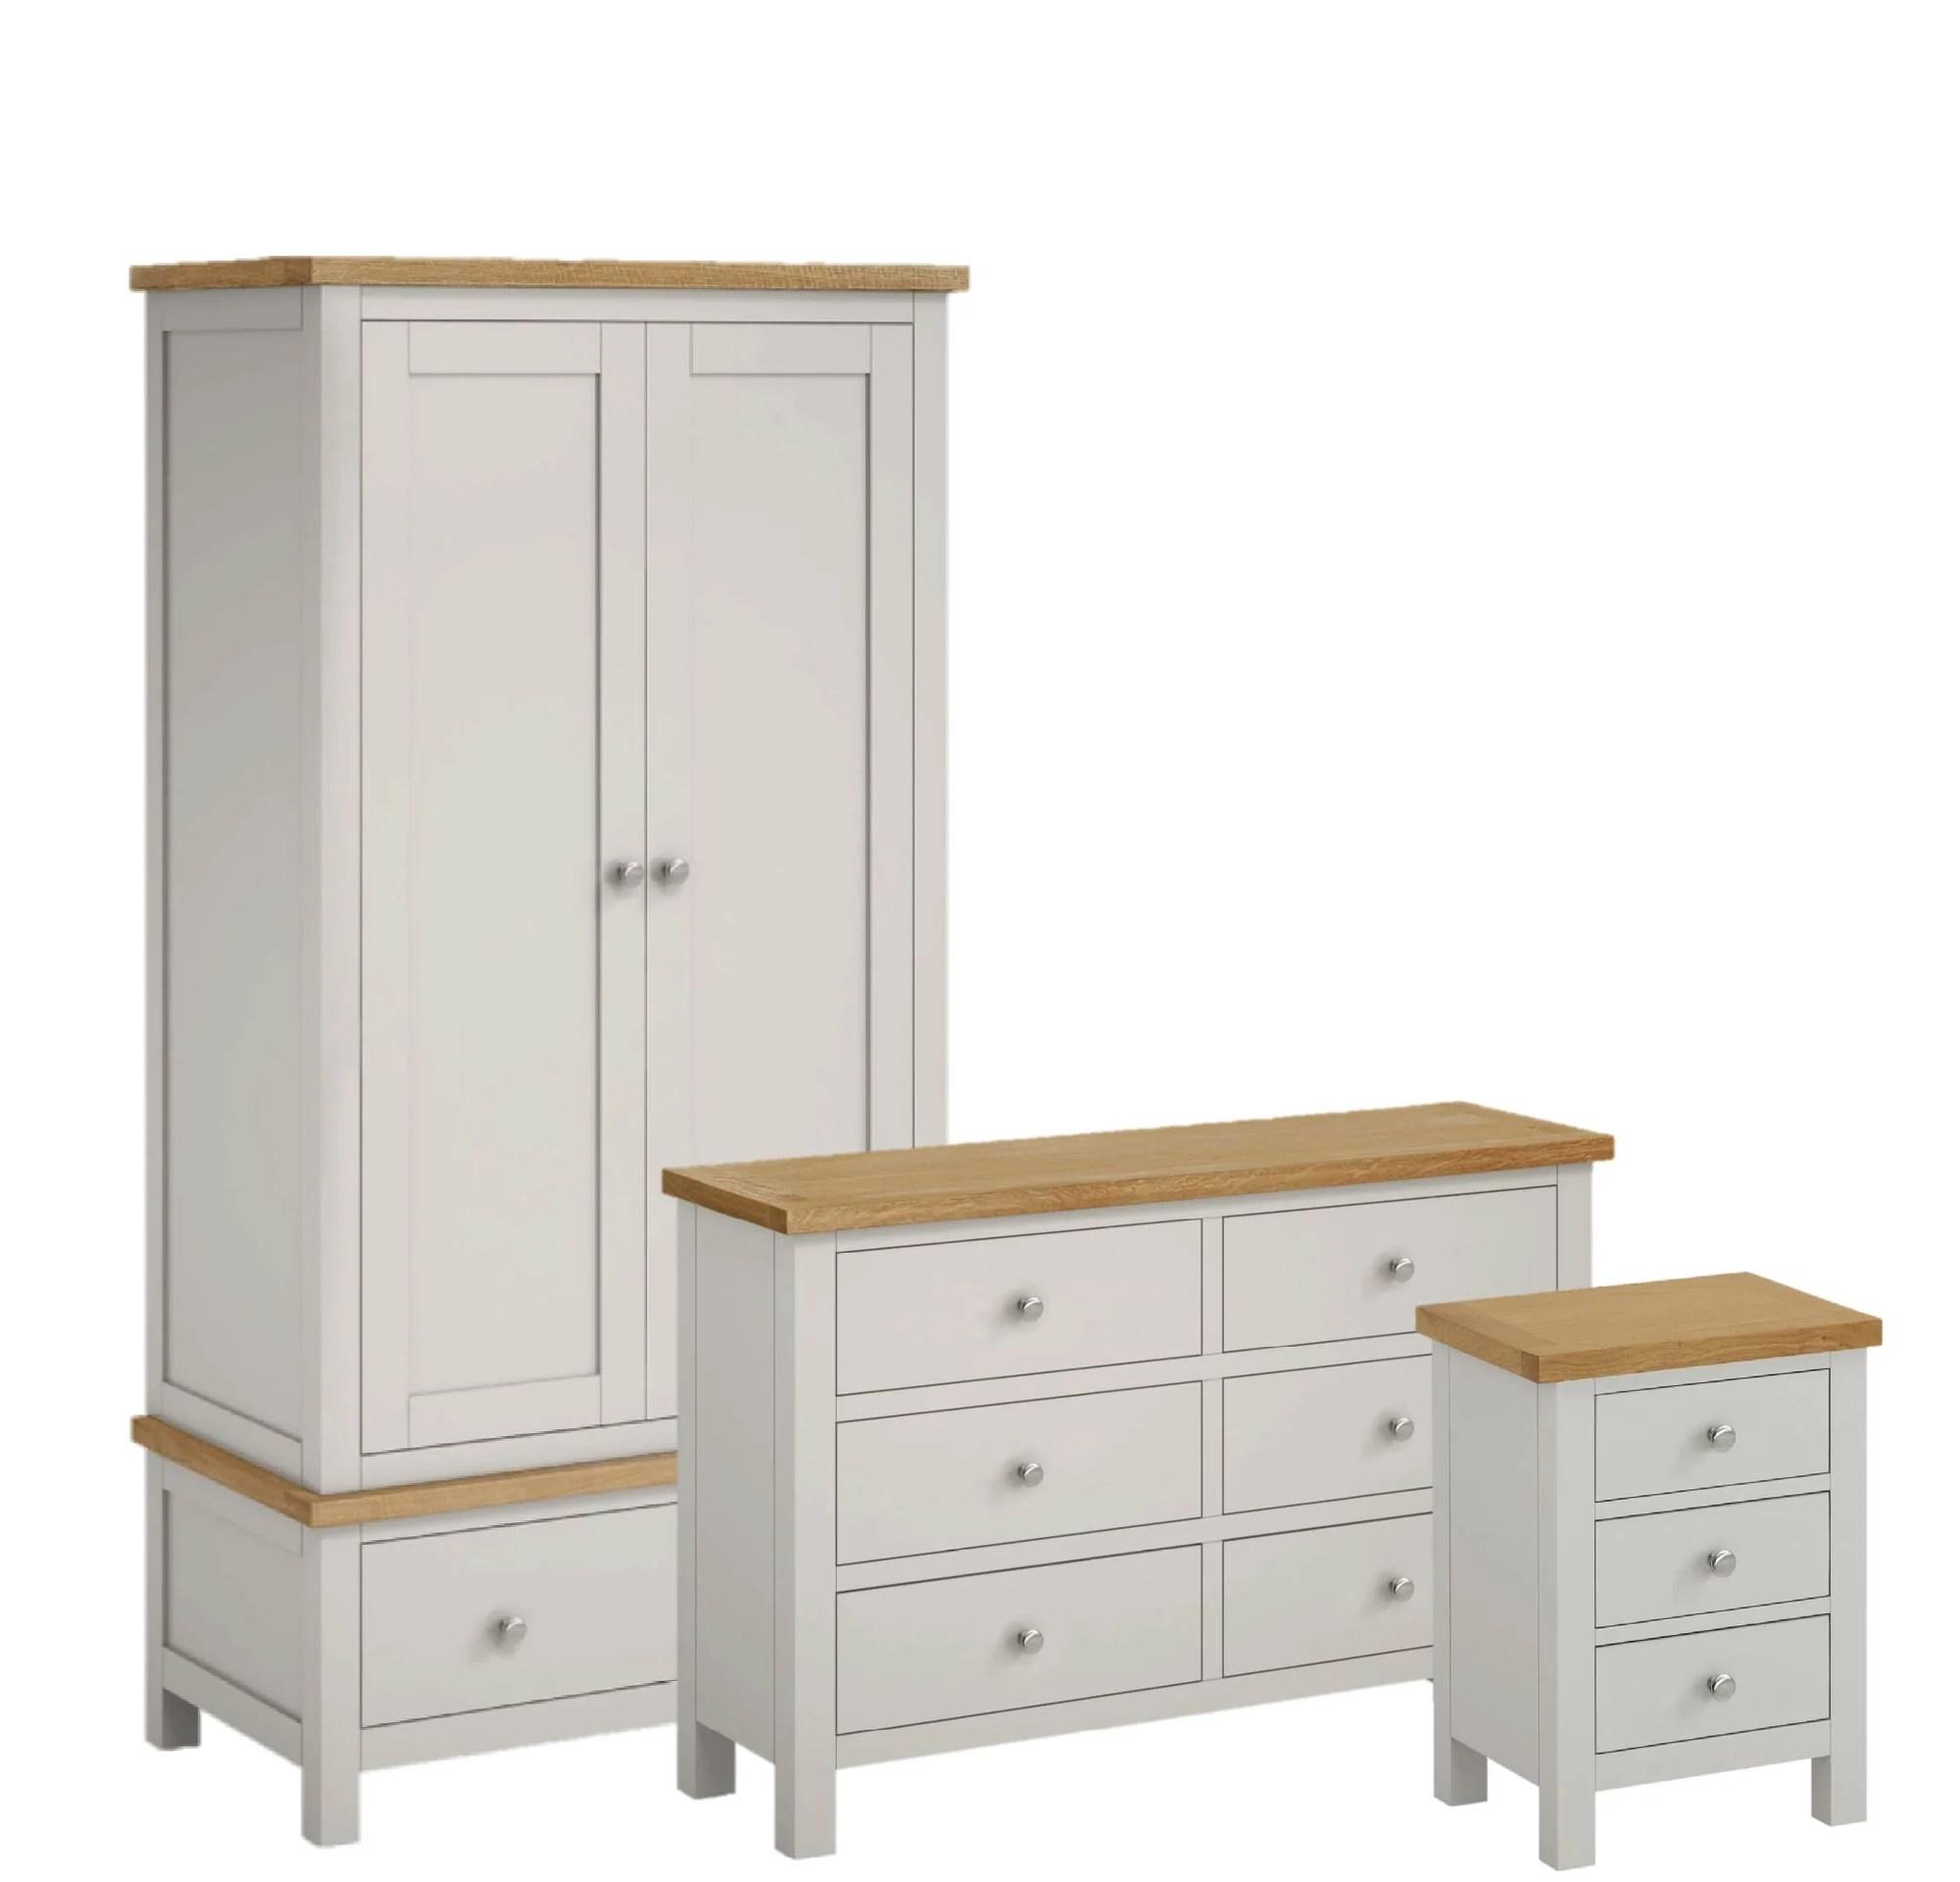 Farrow Grey Painted Bedroom Set Large Chest Wardrobe Bedside Oak Roseland Furniture